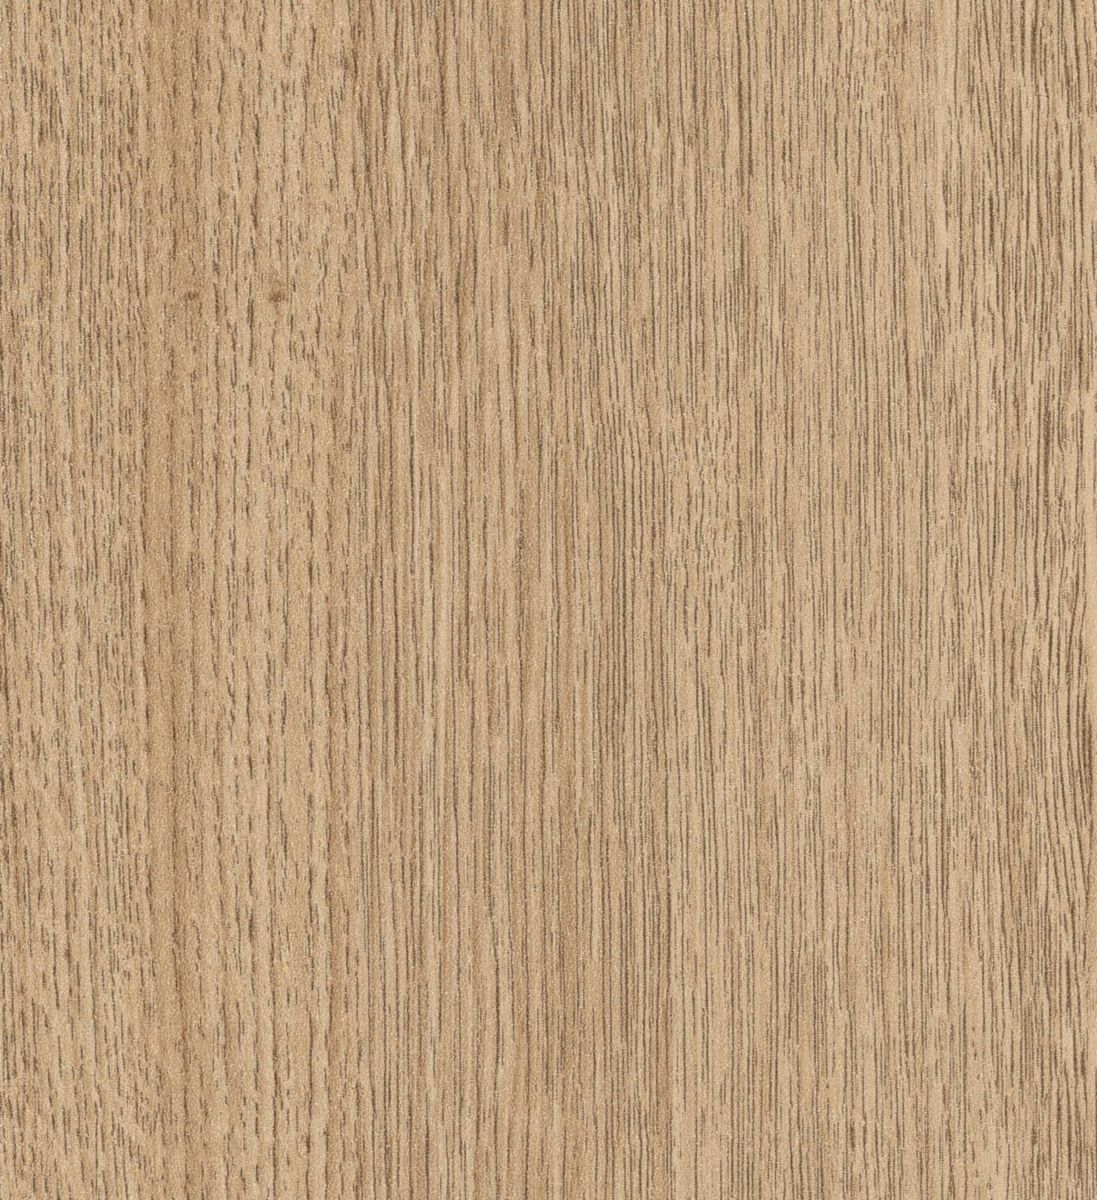 Prix Feuille Stratifié Formica stratifié hpl woods hgp smoked oak f1062 nat naturel 305x130cm 0,7mm